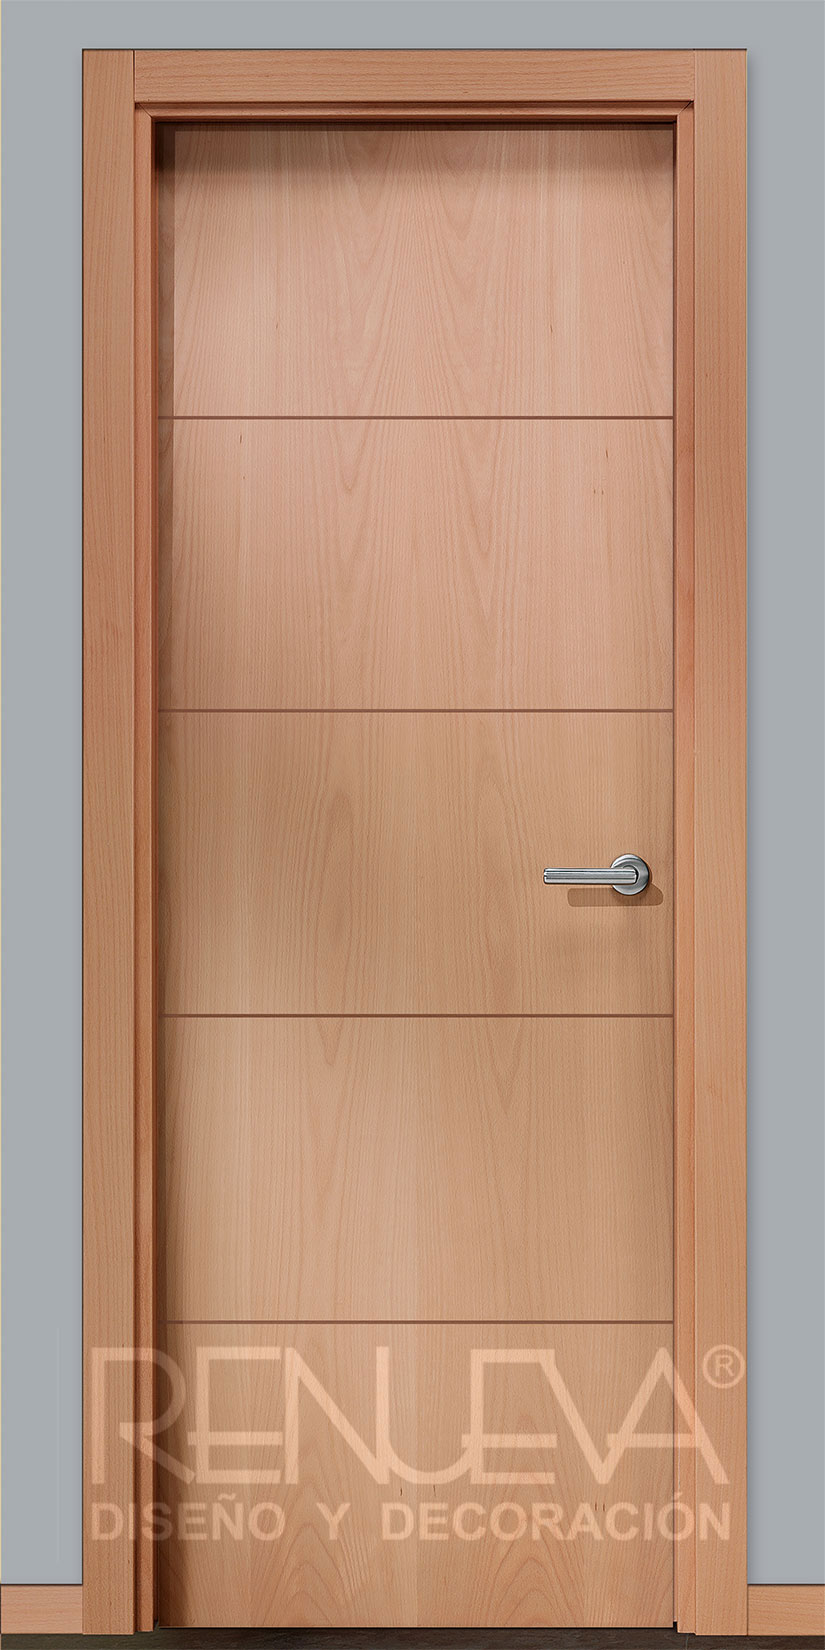 Puerta lisa rallada modelo rt5p haya melamina for Tejados de madera para puertas